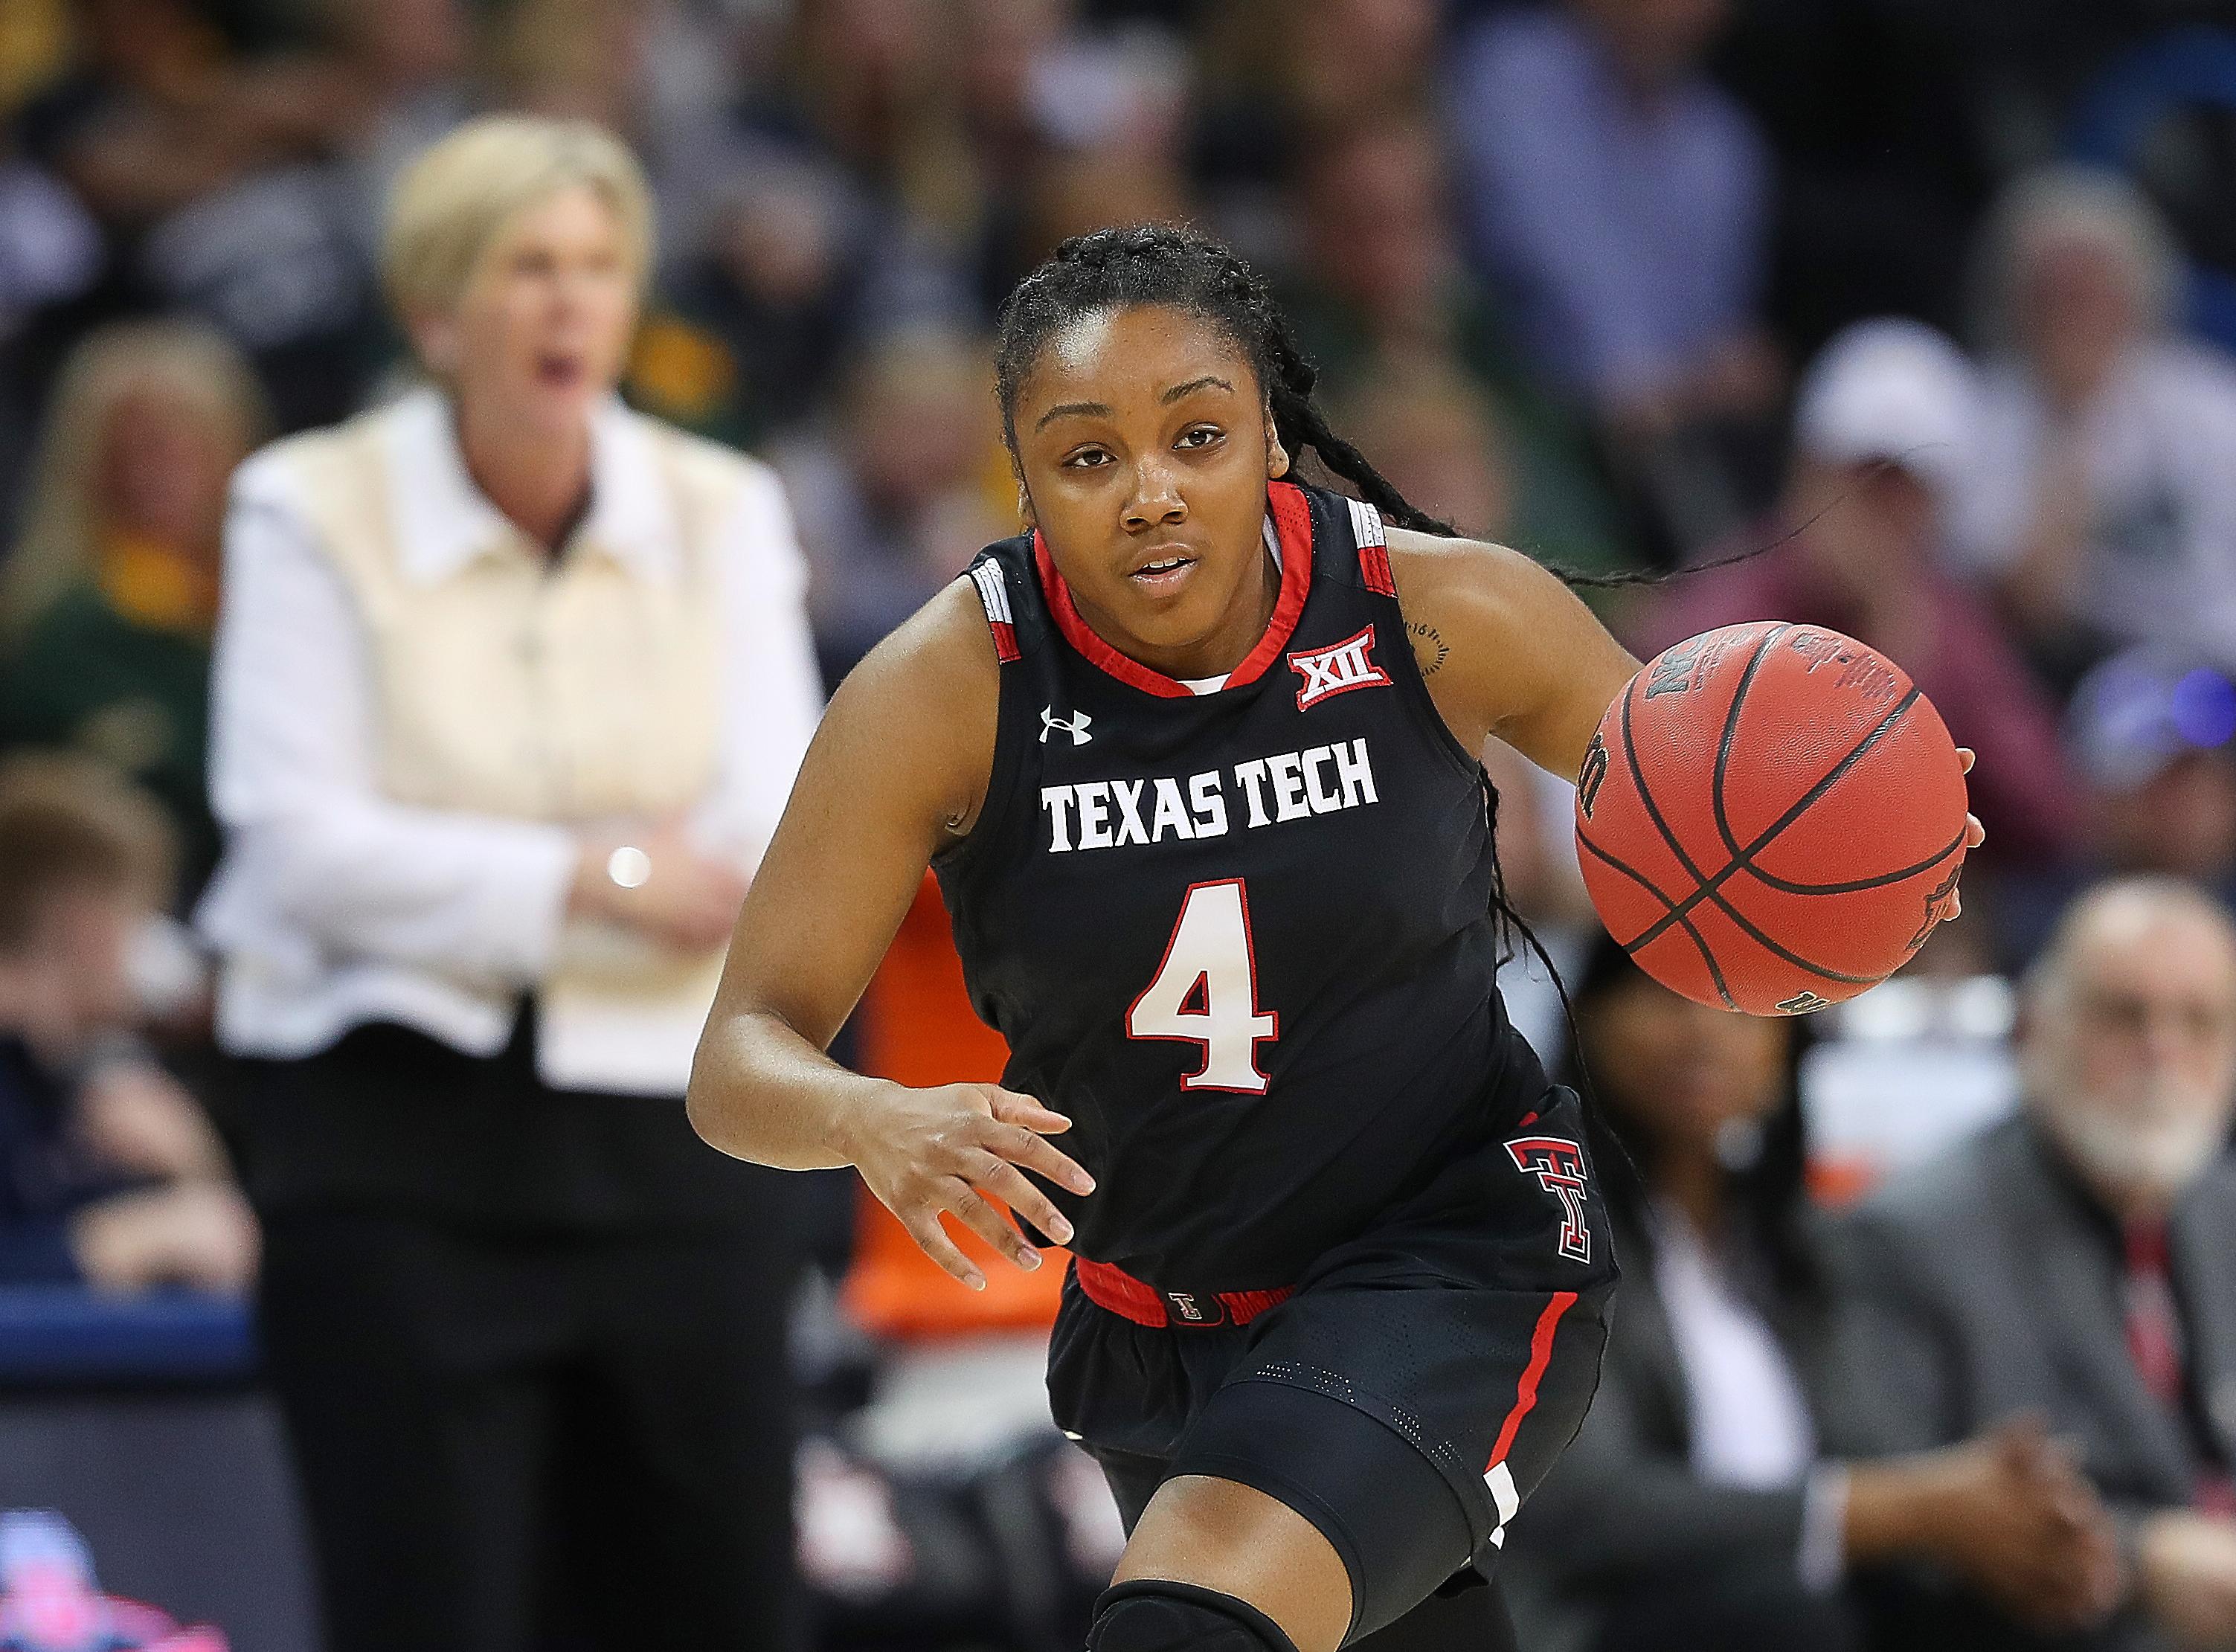 COLLEGE BASKETBALL: MAR 09 Big 12 Conference Women's Championship - Baylor v Texas Tech